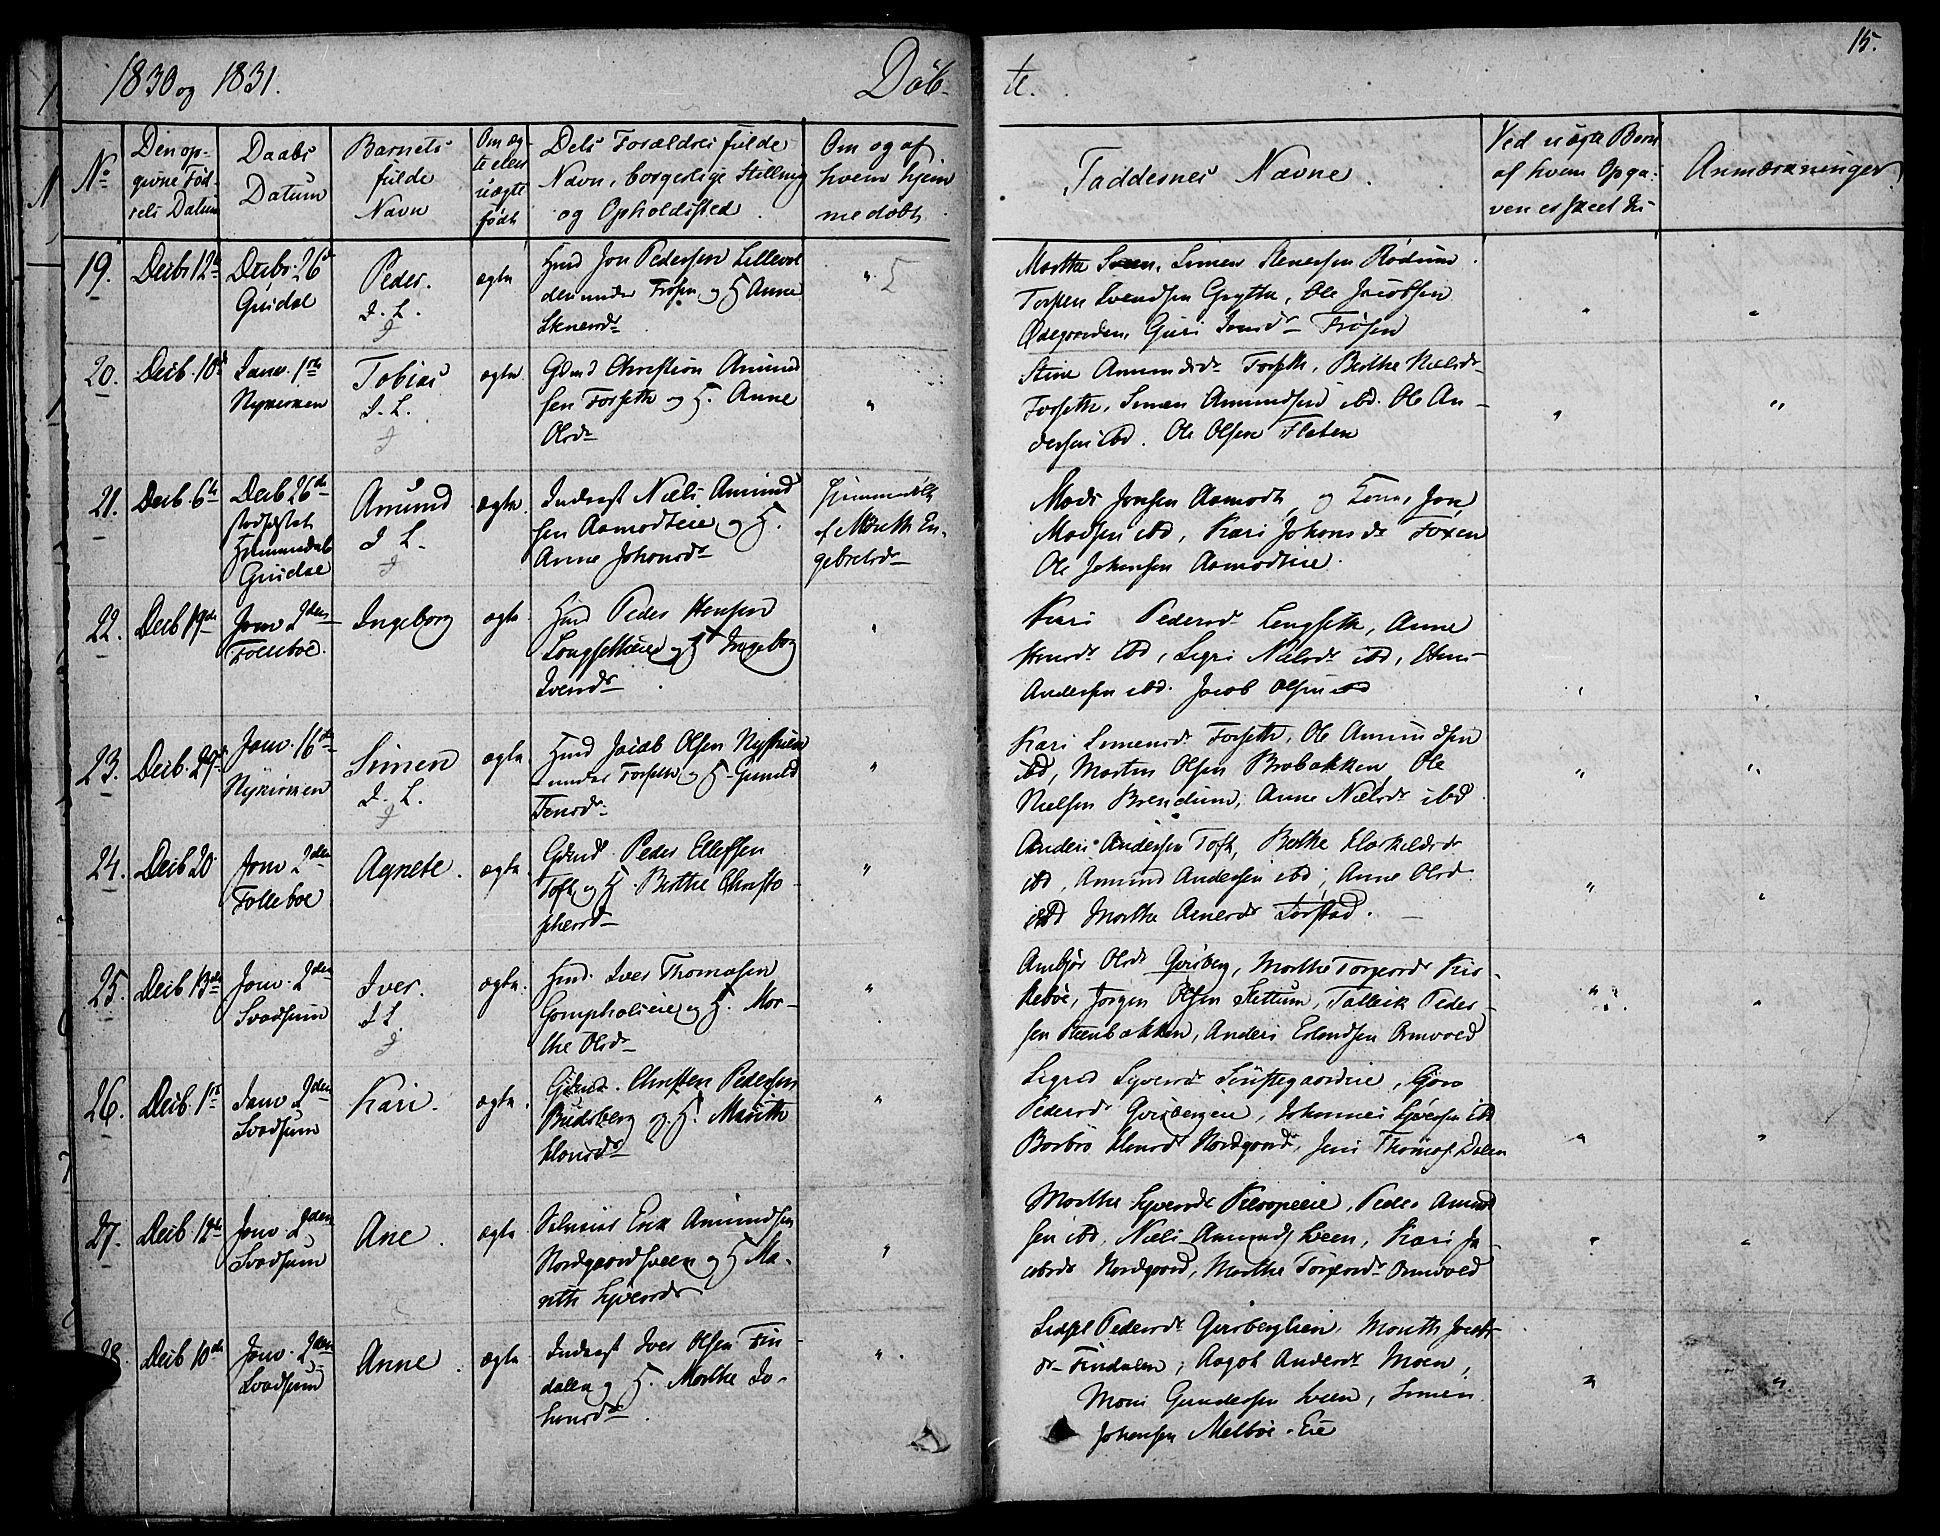 SAH, Gausdal prestekontor, Ministerialbok nr. 6, 1830-1839, s. 15